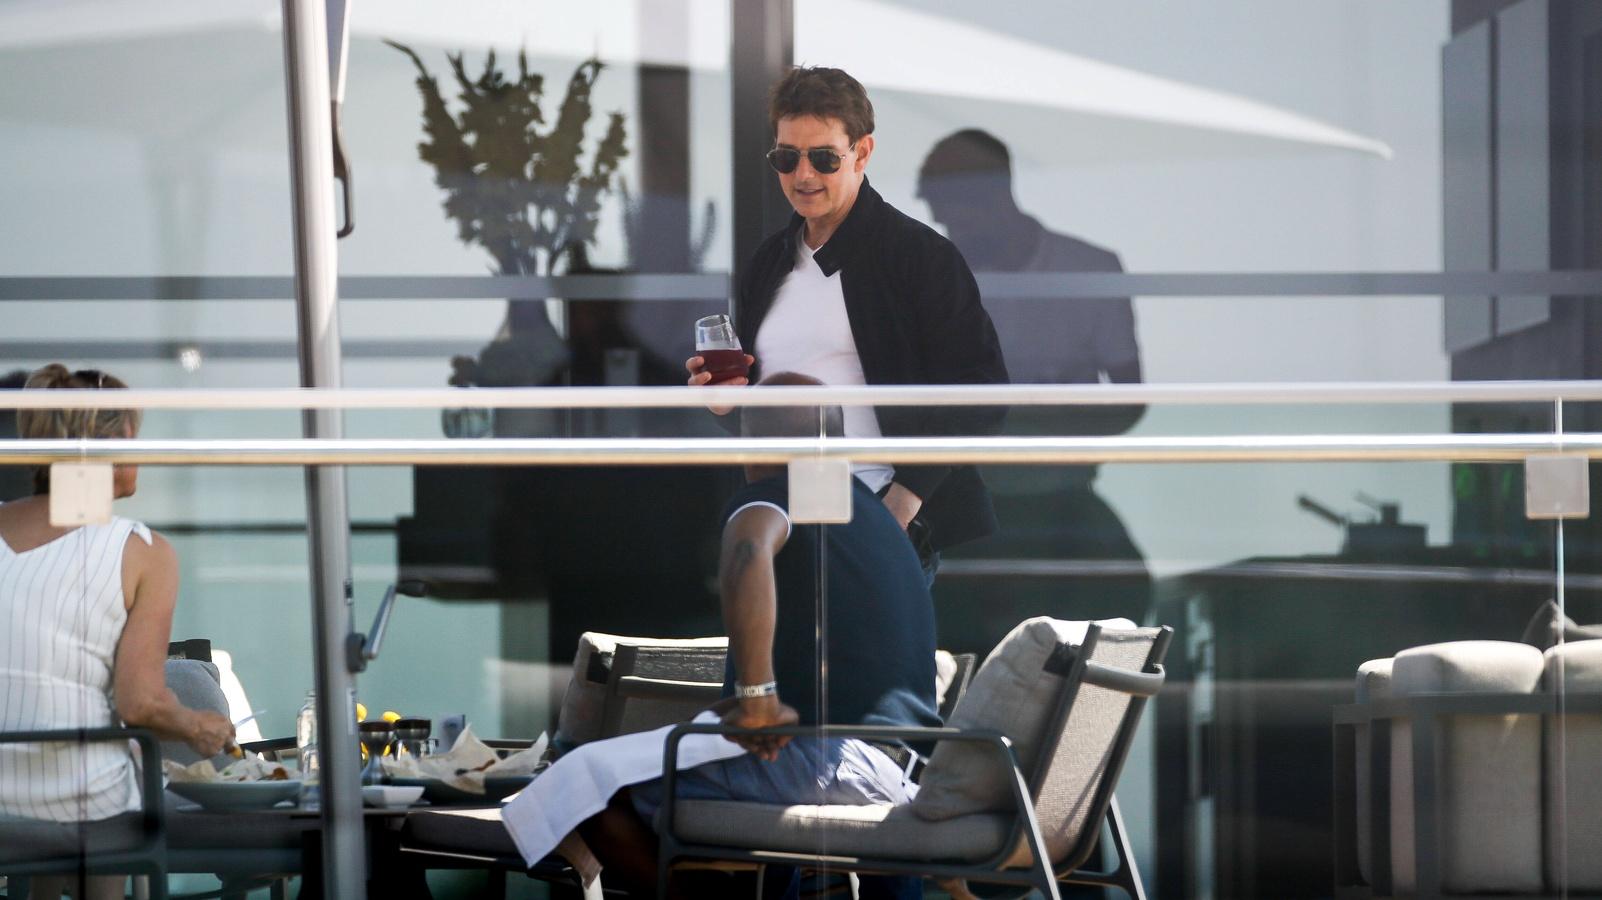 Том Круз с бокалом вина